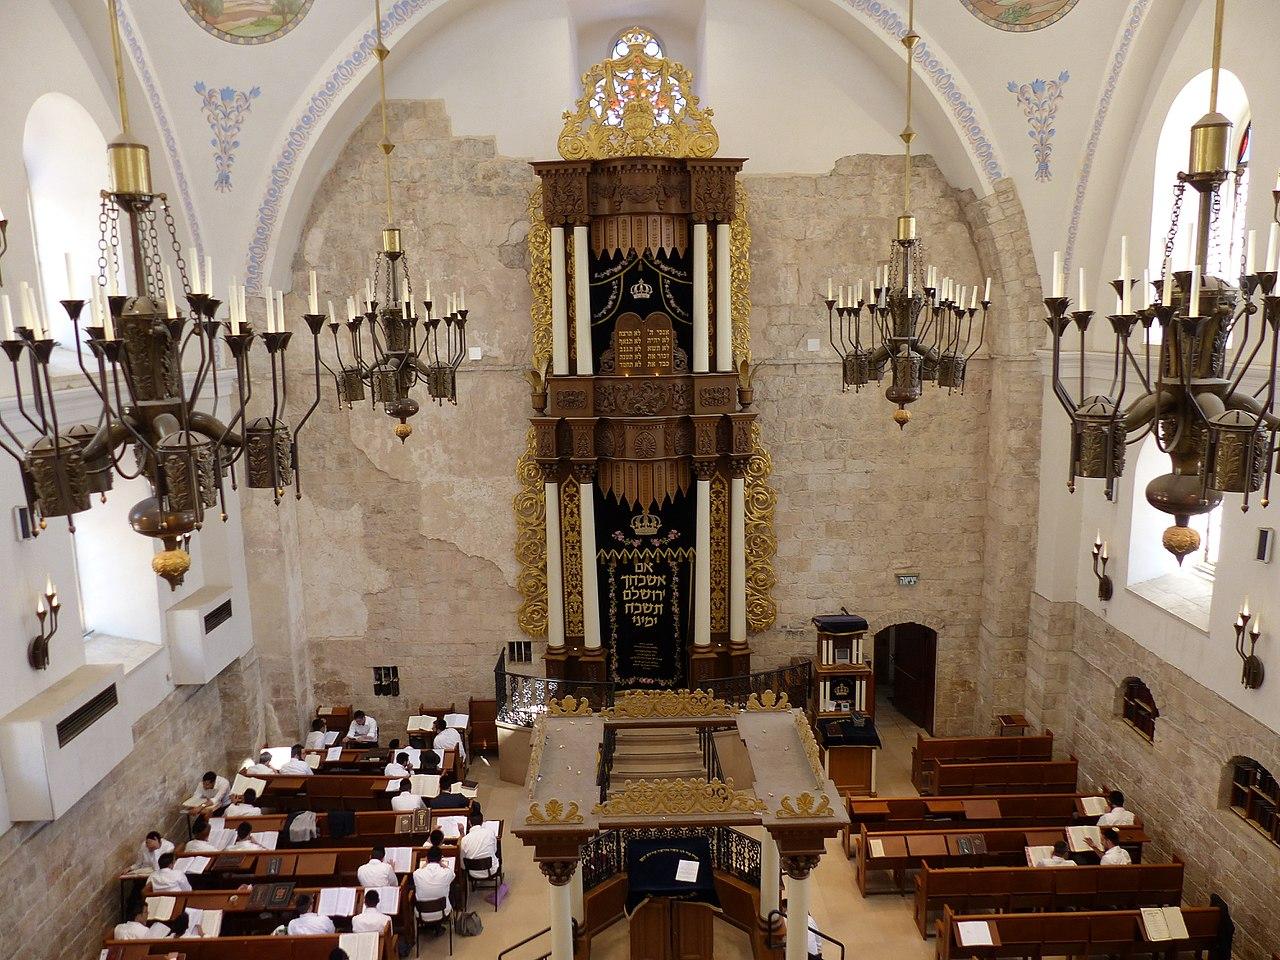 File:Interior de la sinagoga Hurva, Jerusalén, Israel ...